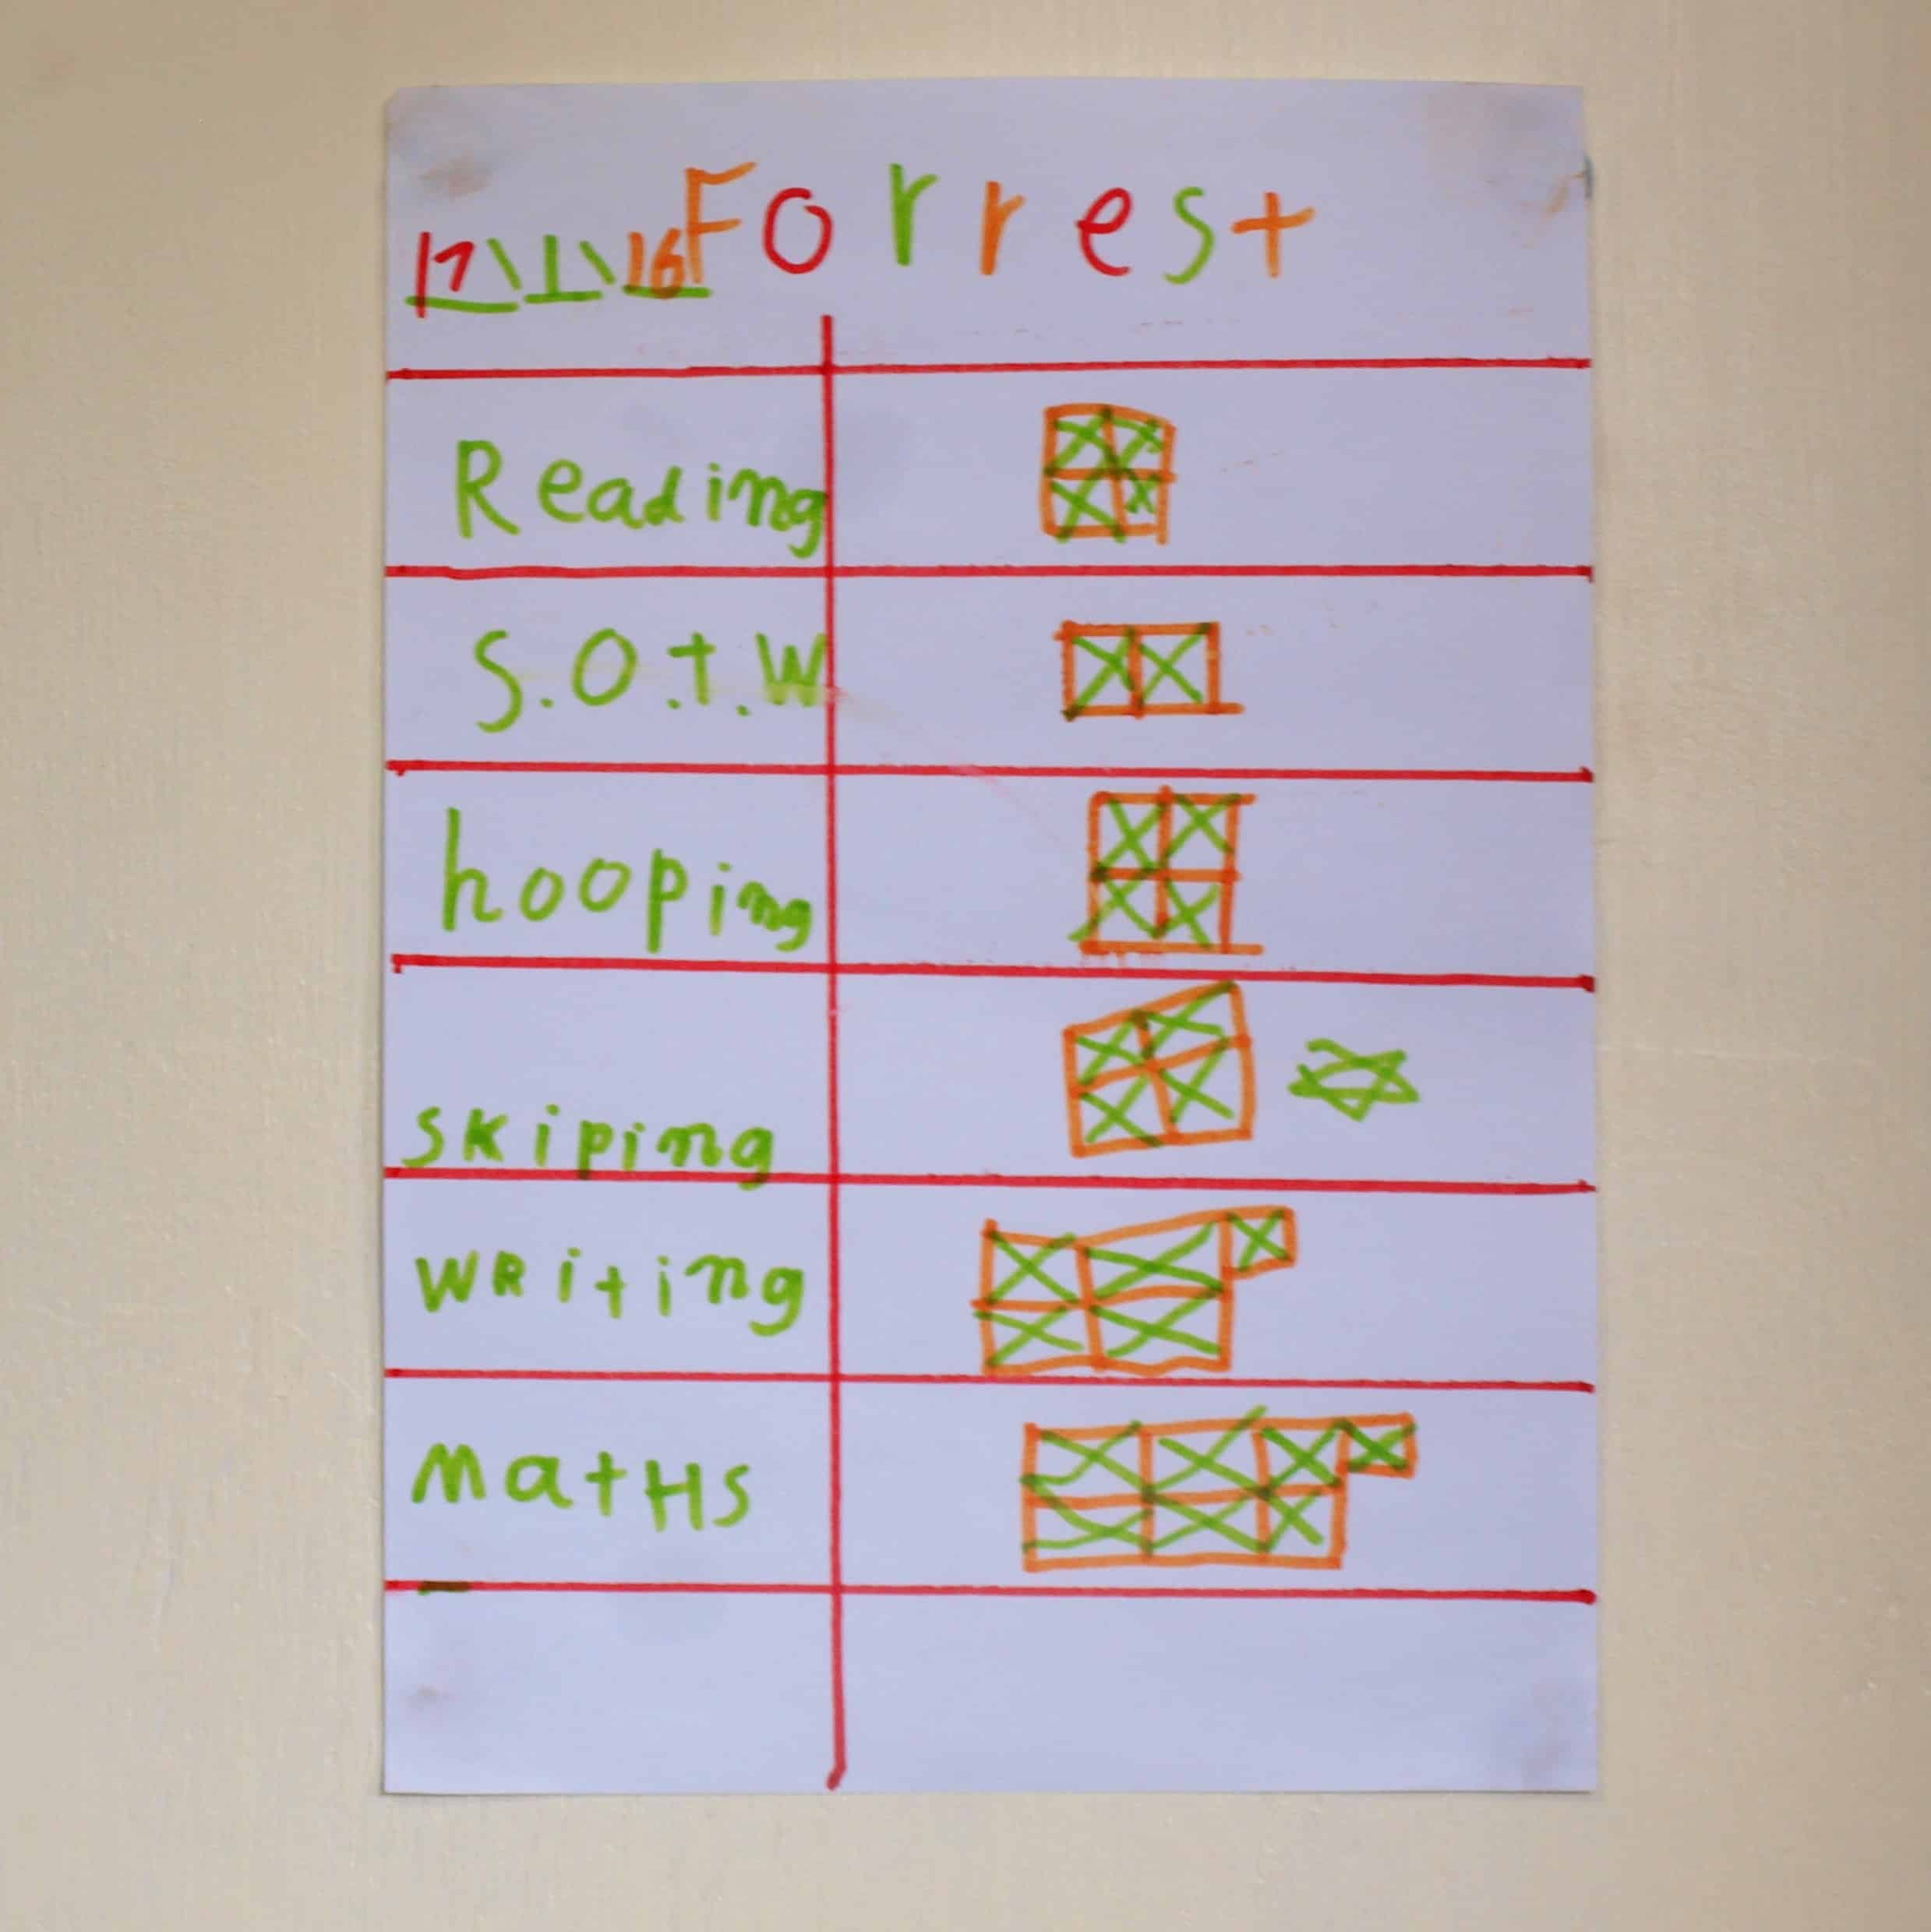 Weekly homeschooling work list/schedule - Fearless Homeschool